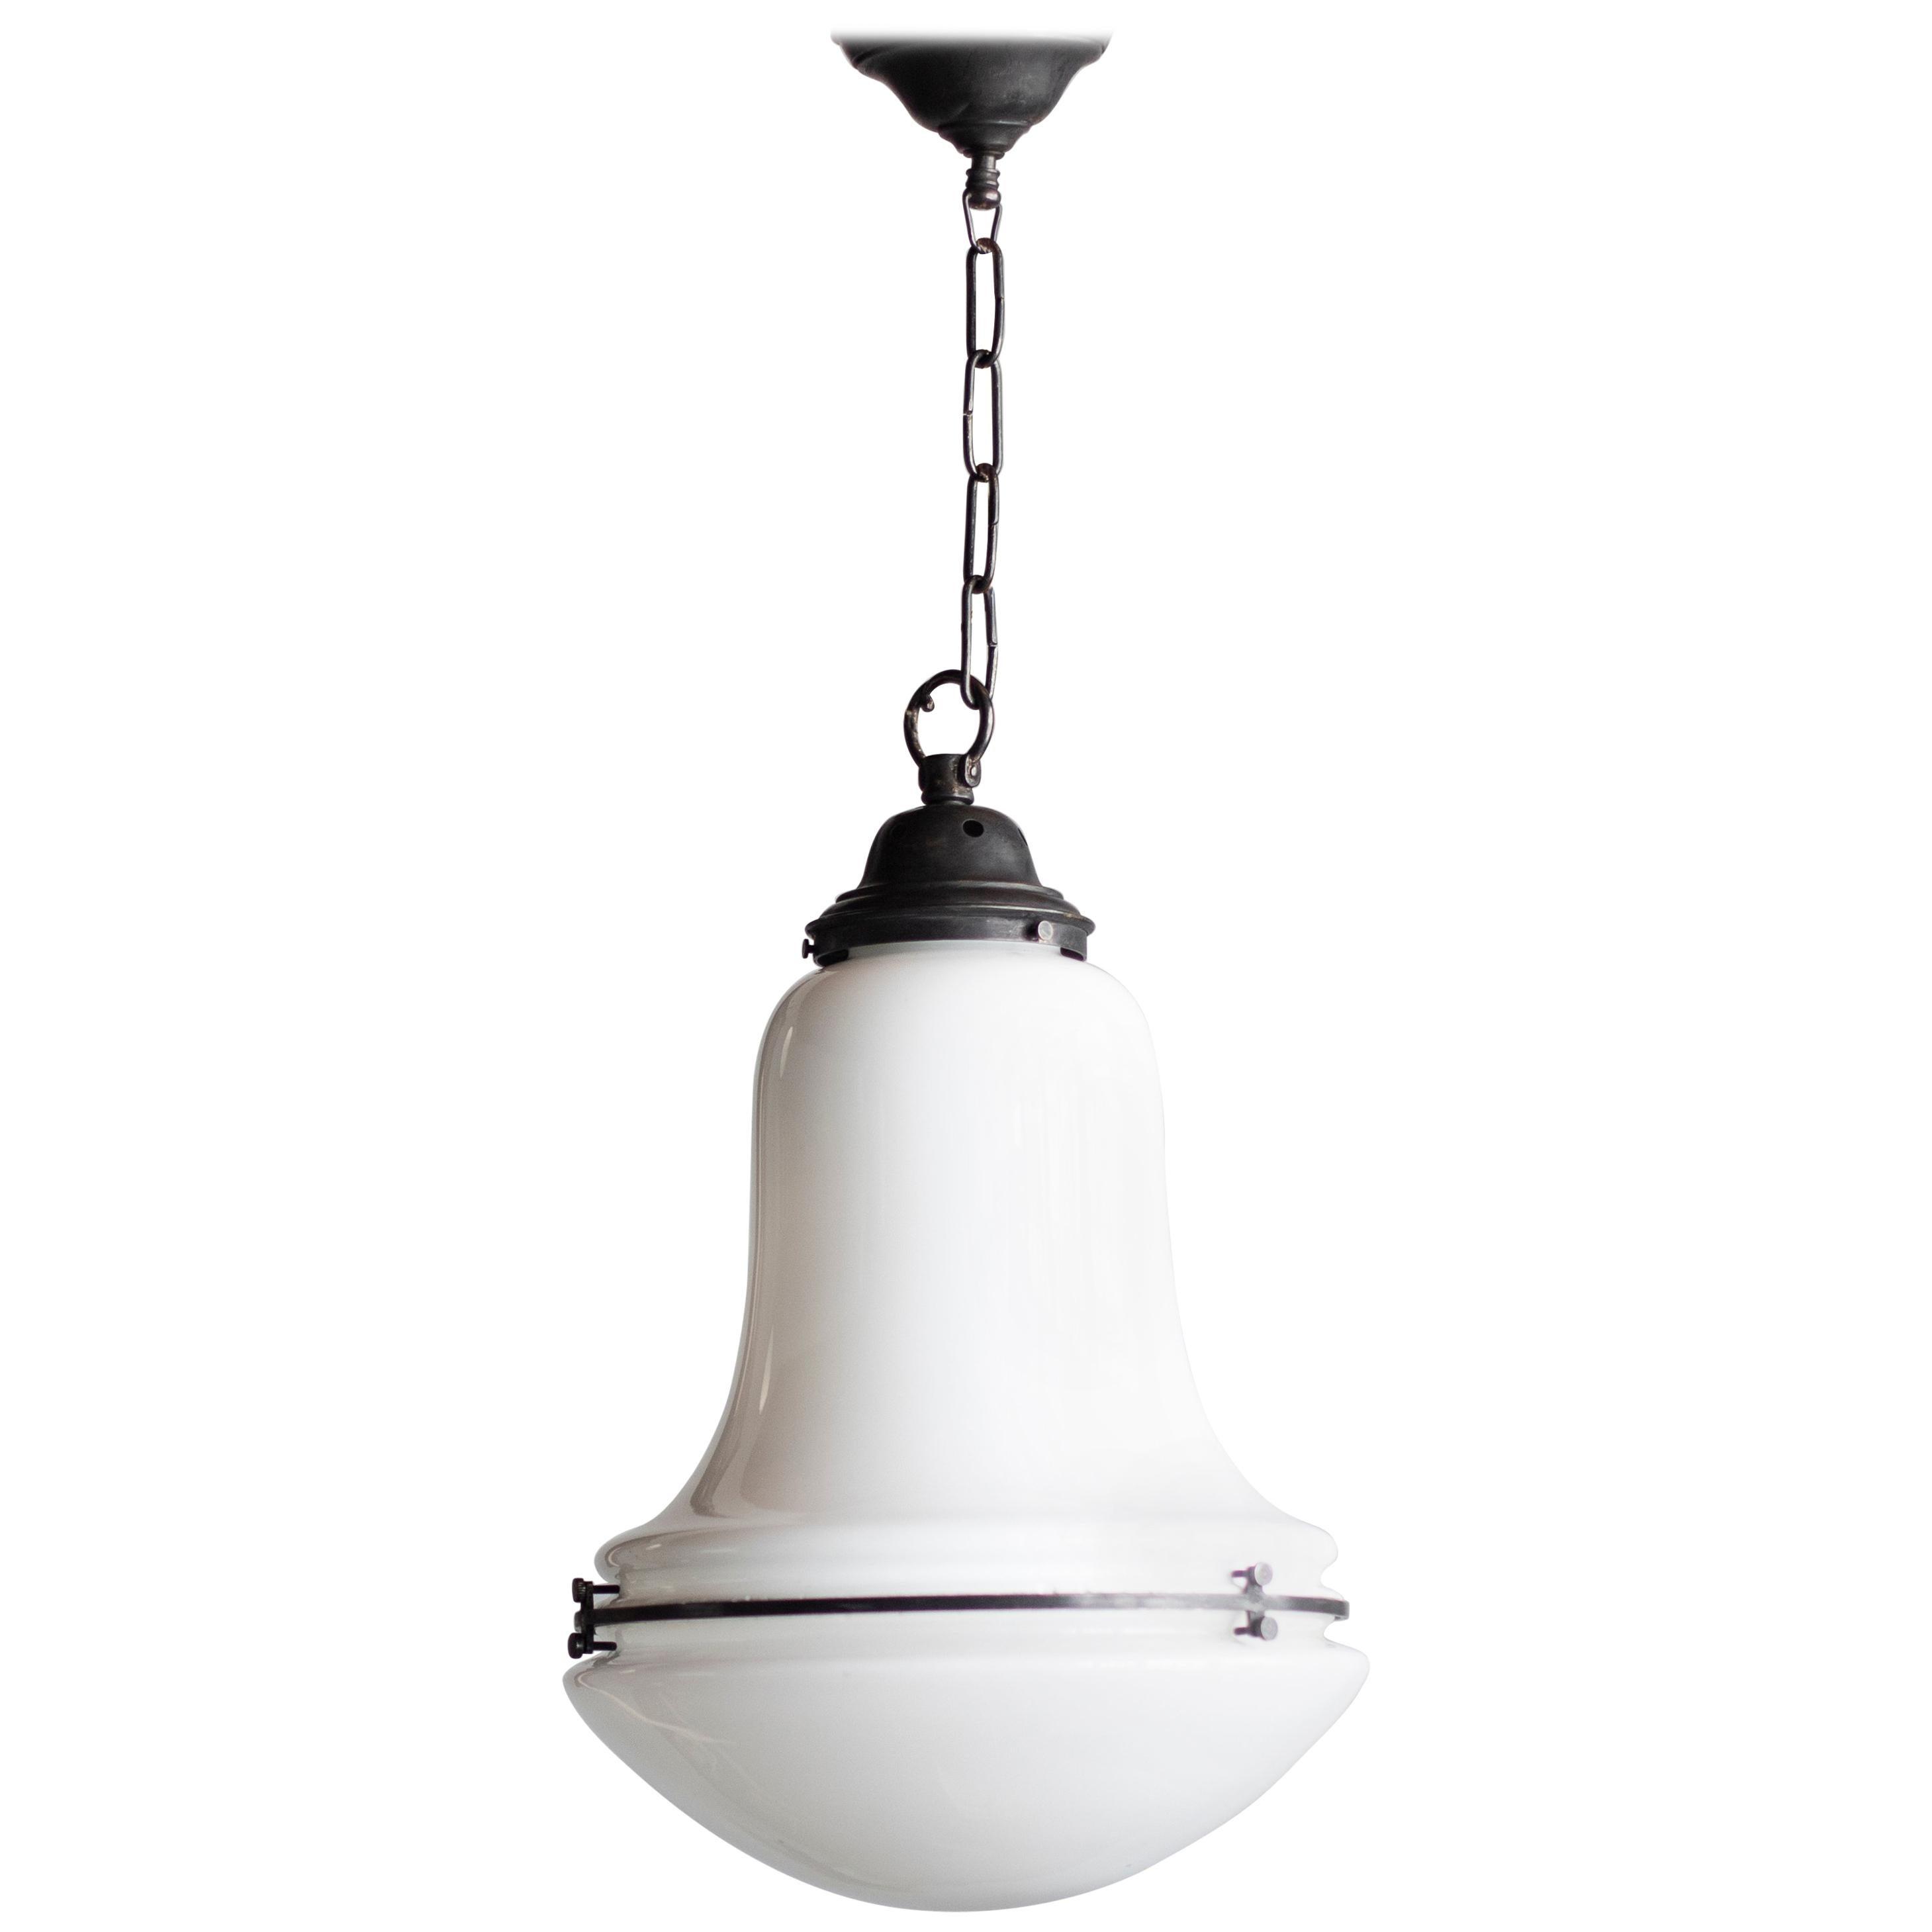 Luzette Pendant Lamp by Peter Behrens